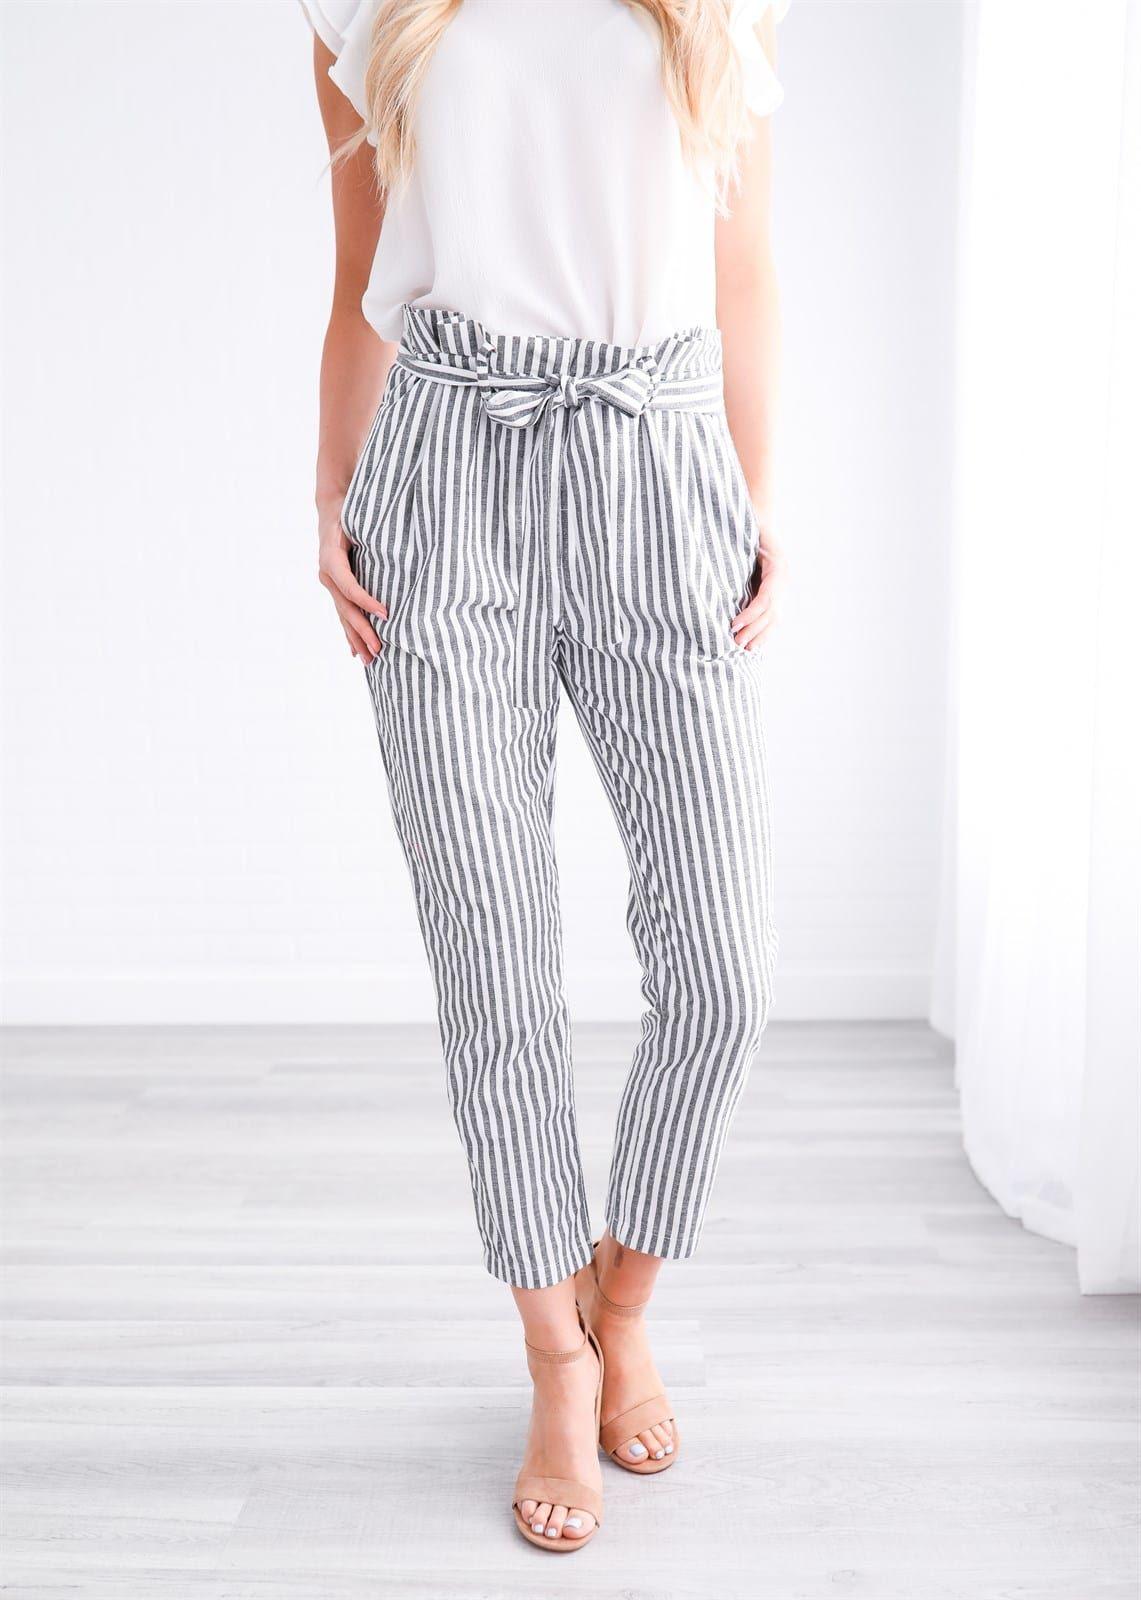 Striped Linen Pant Striped Linen Pants Linen Pants Outfit Striped Linen Pants Outfit [ 1600 x 1141 Pixel ]